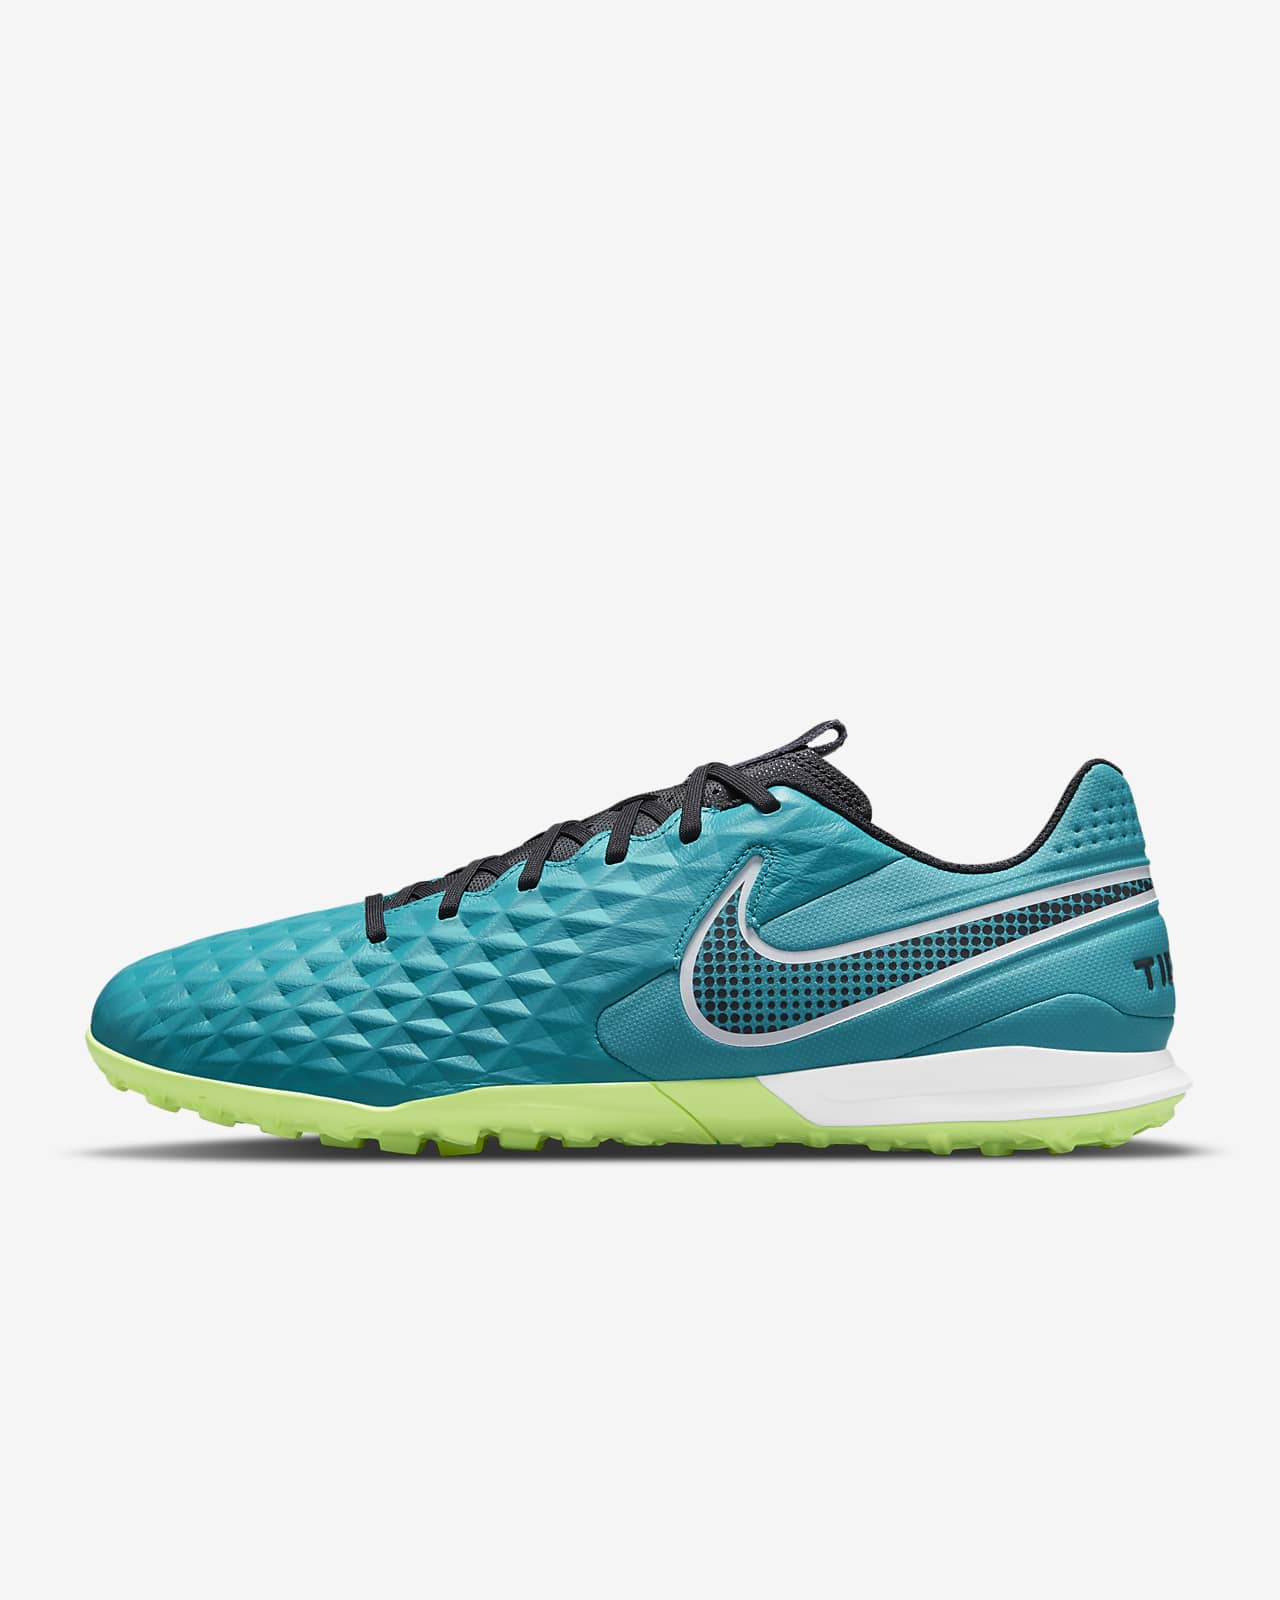 Chaussure de football pour surface synthétique Nike Tiempo Legend 8 Academy TF